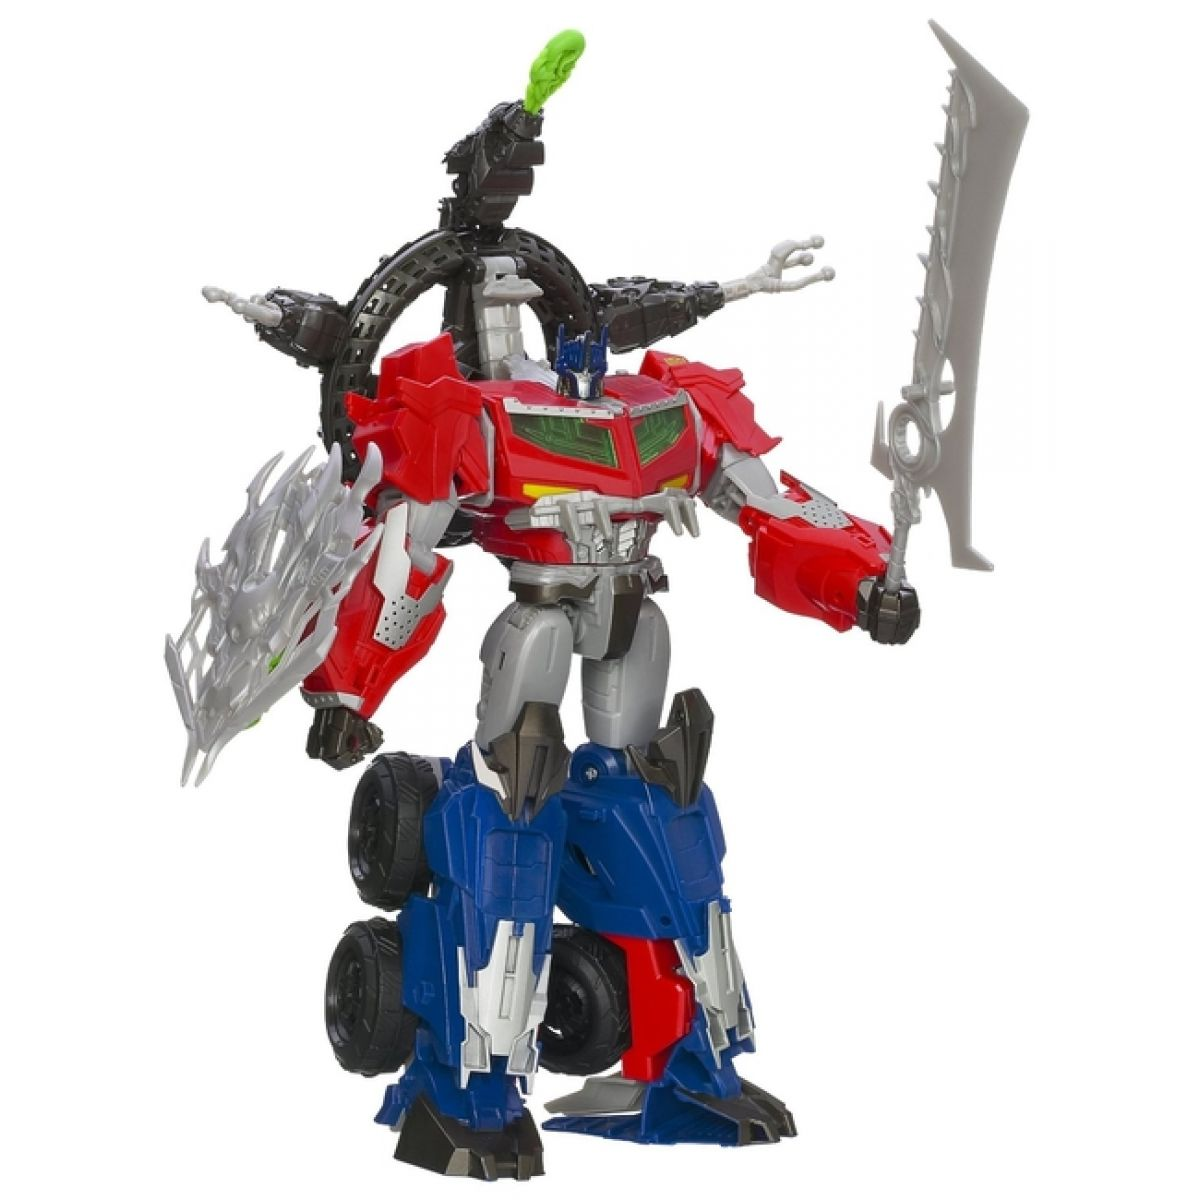 Hasbro A3356 - Transformers - Optimus Prime - Lovec Příšer